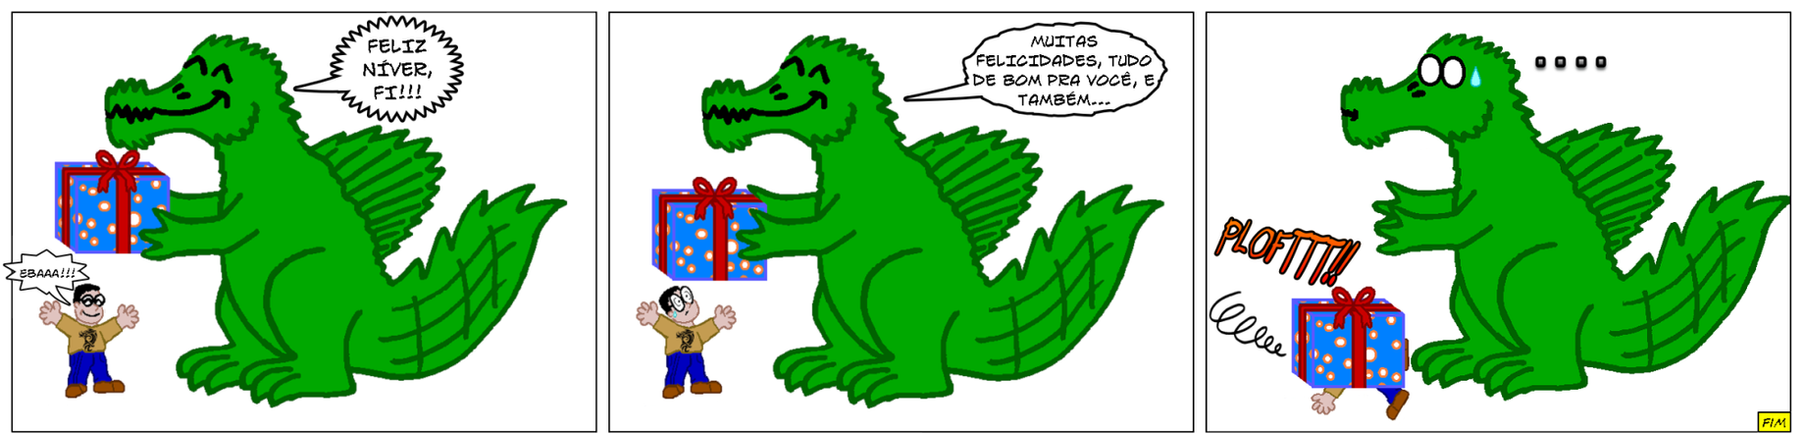 Happy Birthday Buddy by Draco-Saurian